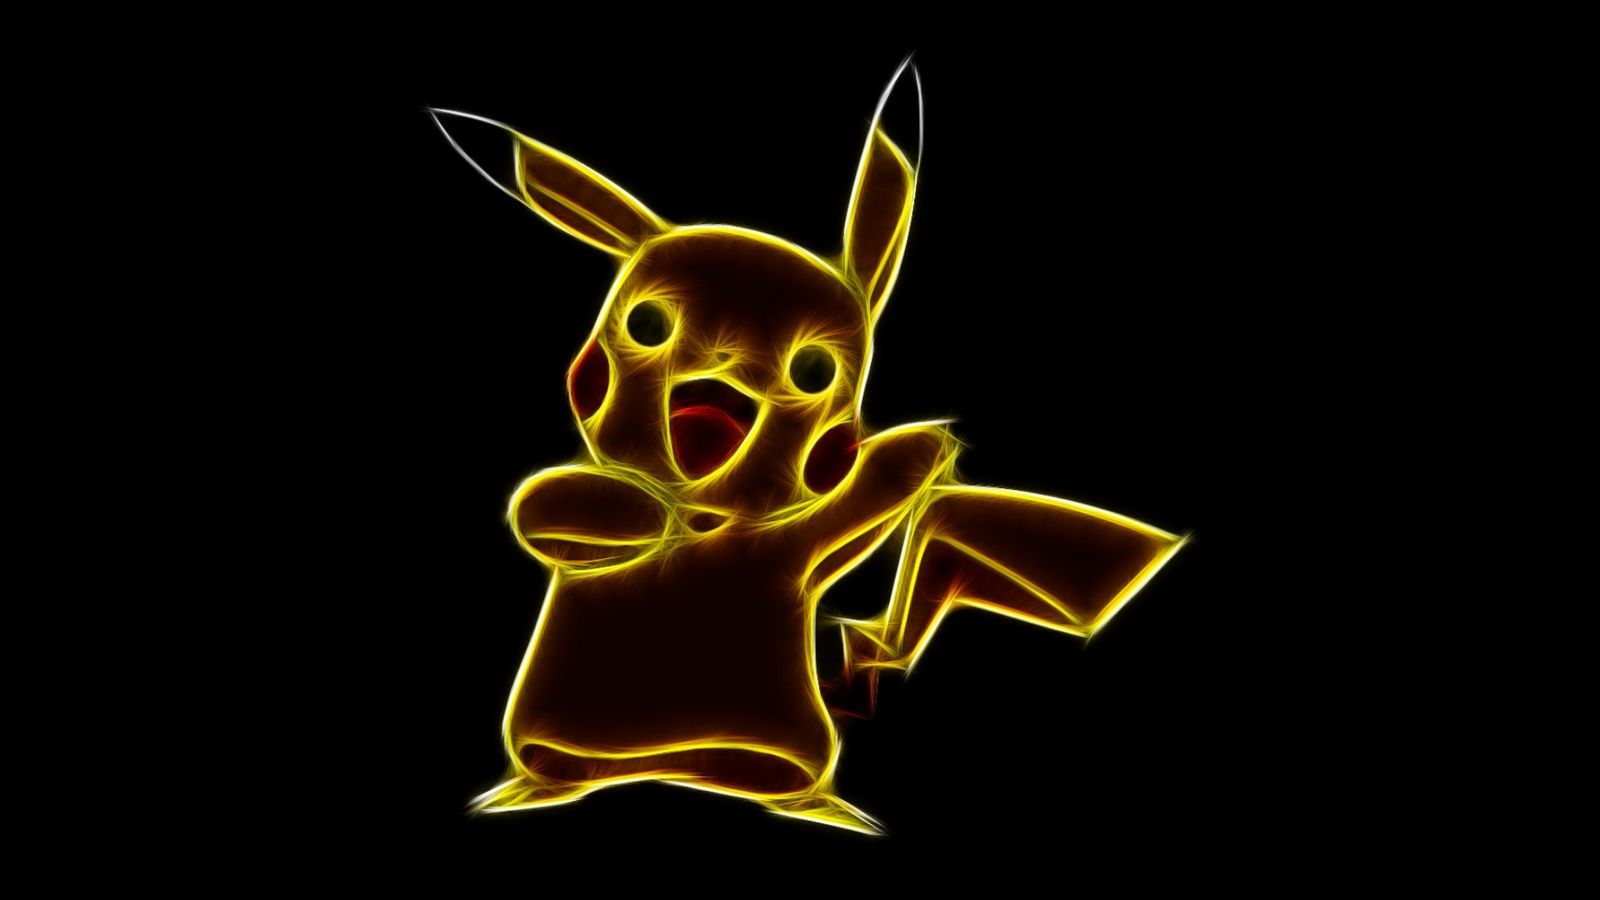 Pikachu 3D Wallpapers - Top Free Pikachu 3D Backgrounds ...